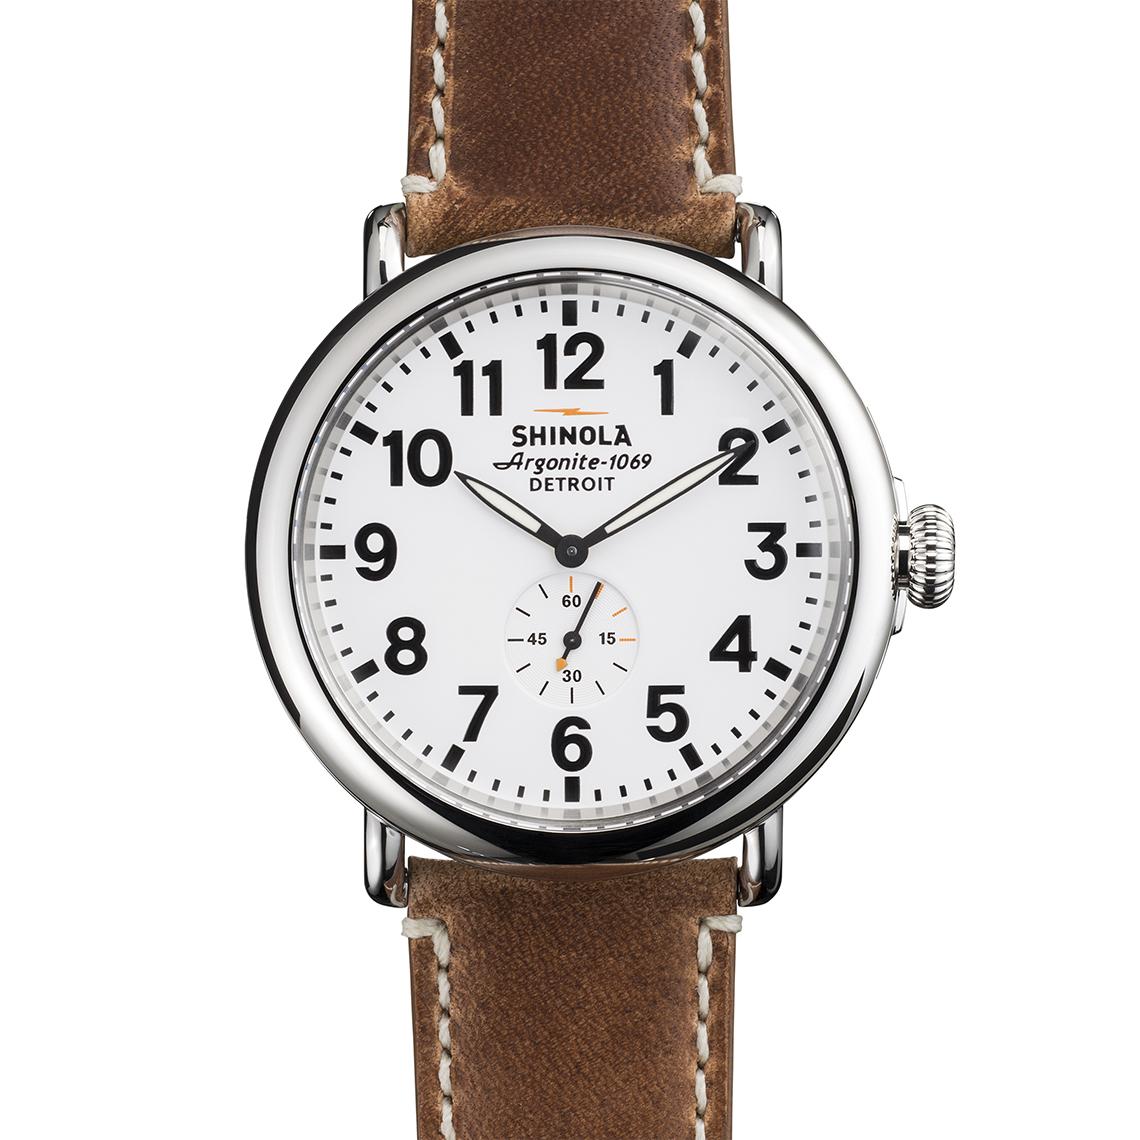 Shinola casual analog watch with stylish leather band